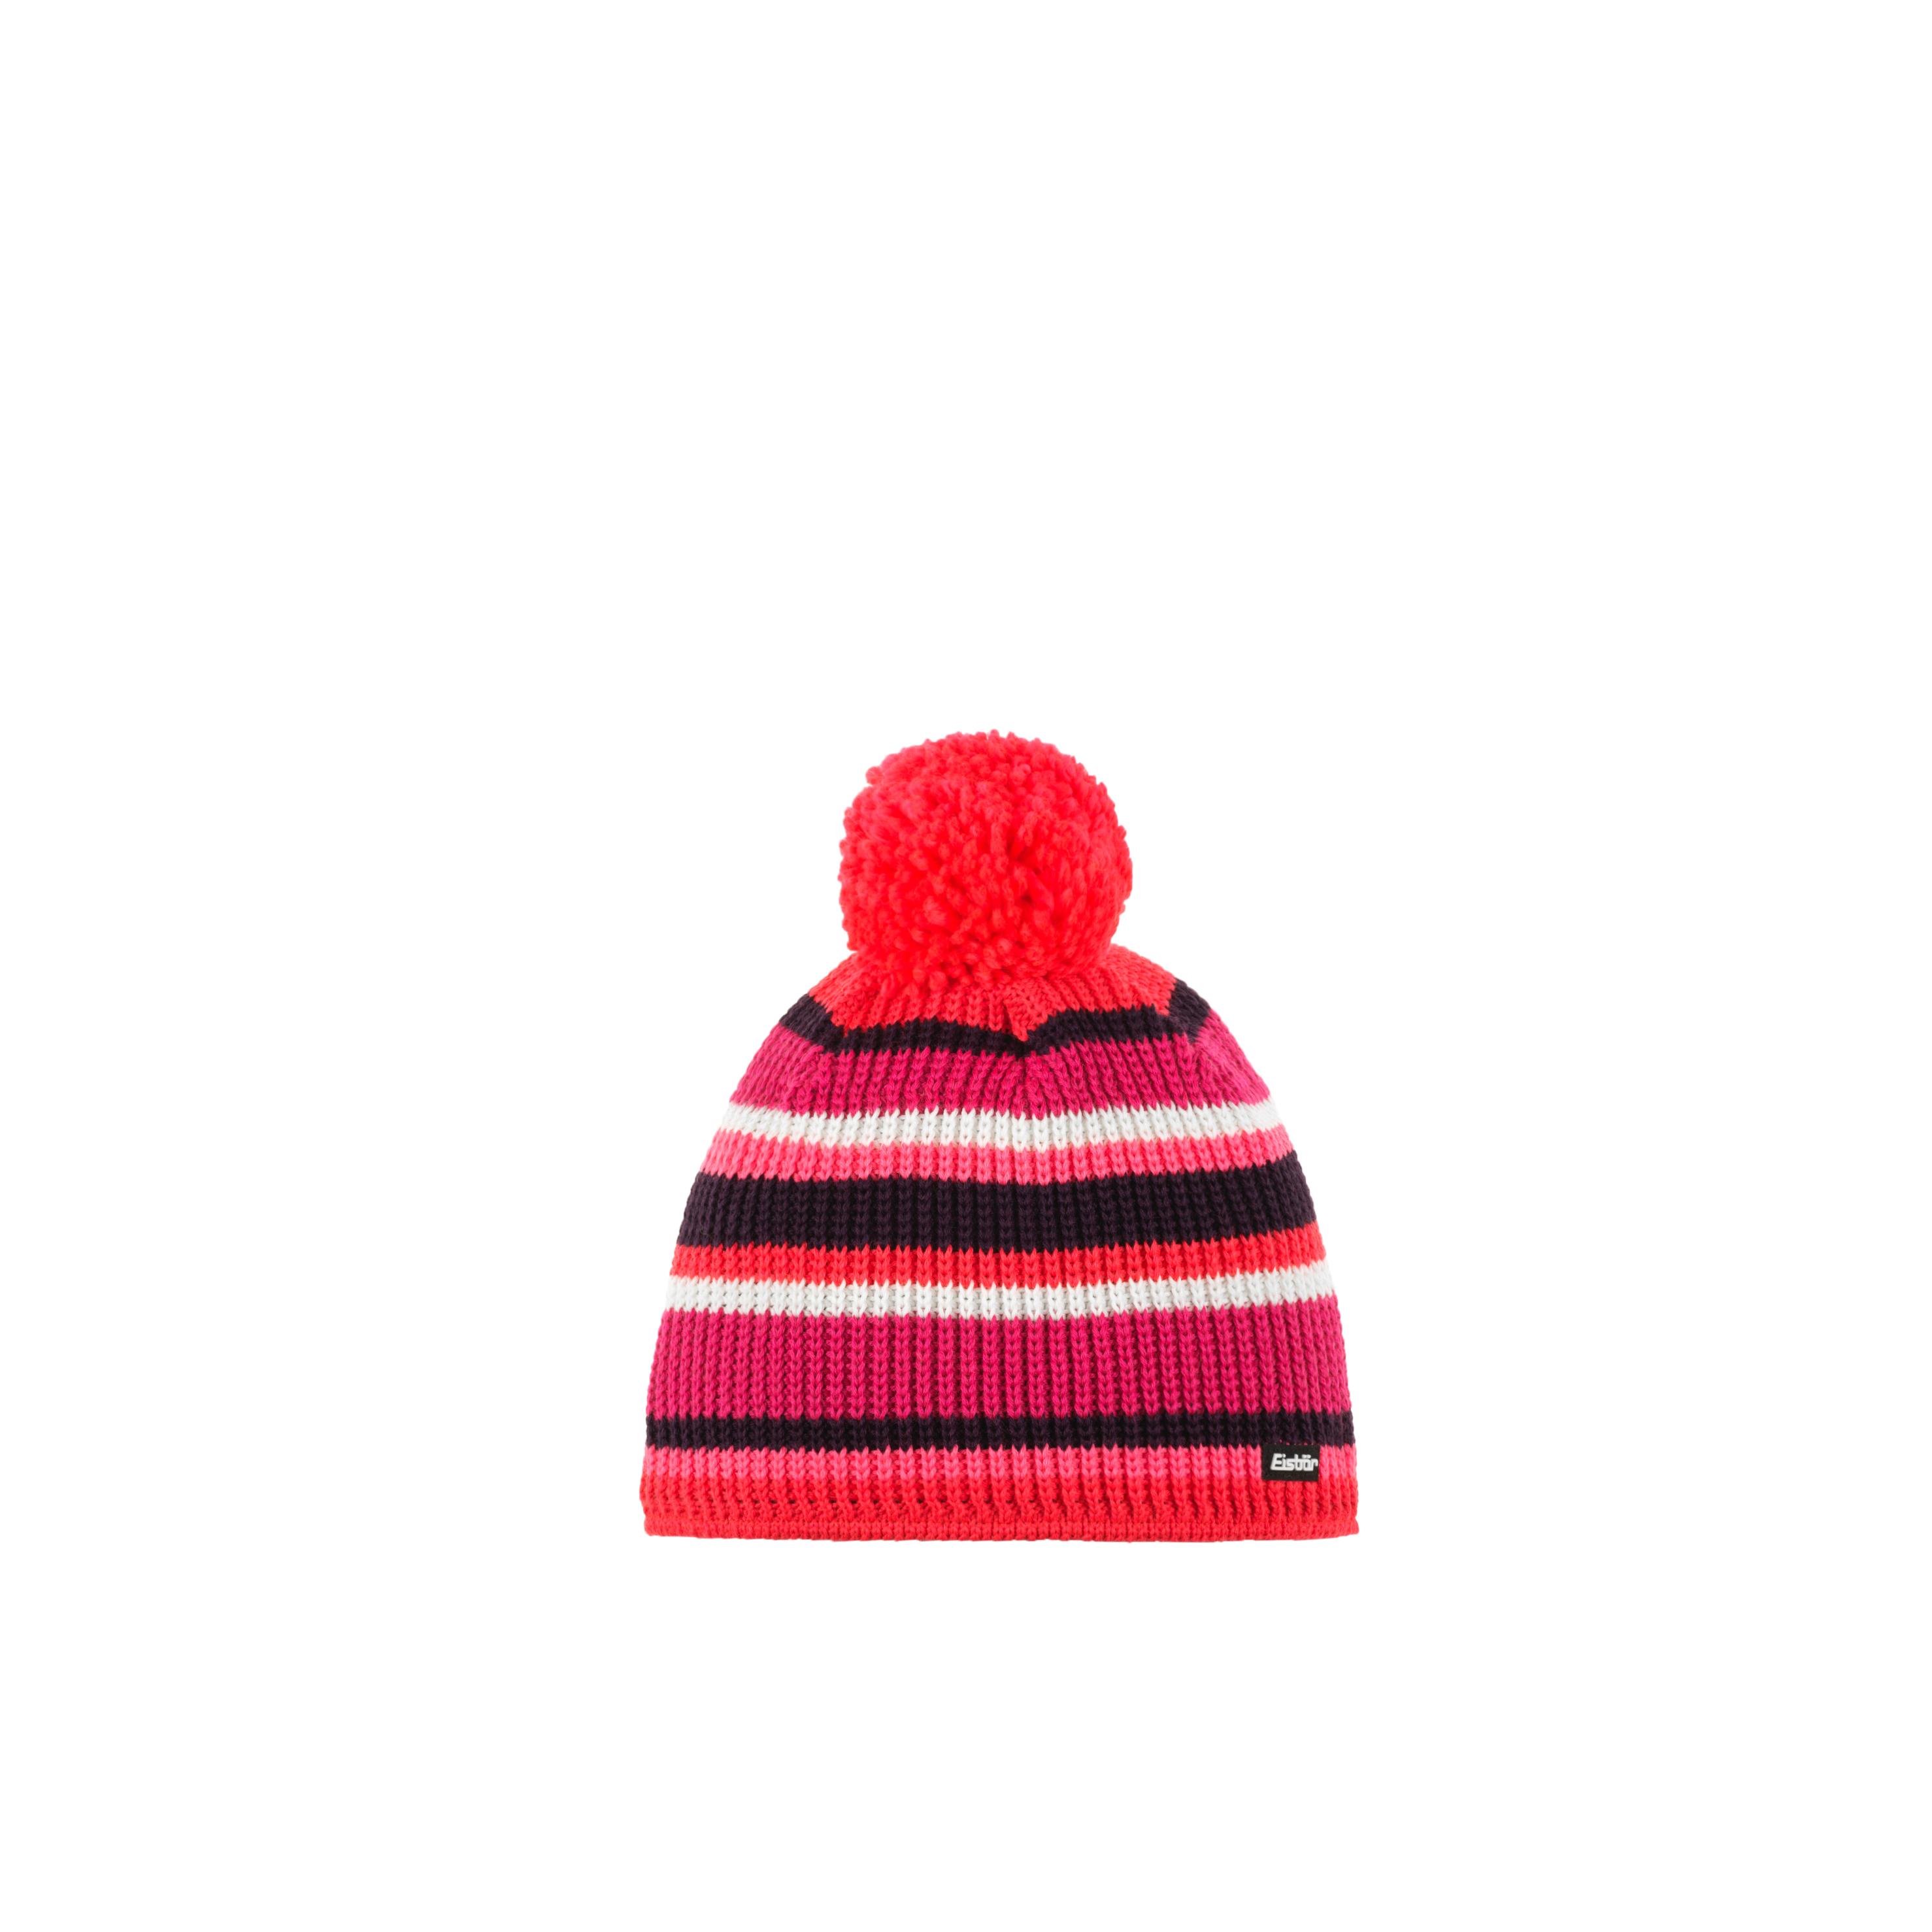 Eisbär Clip Pompon Mütze - rot